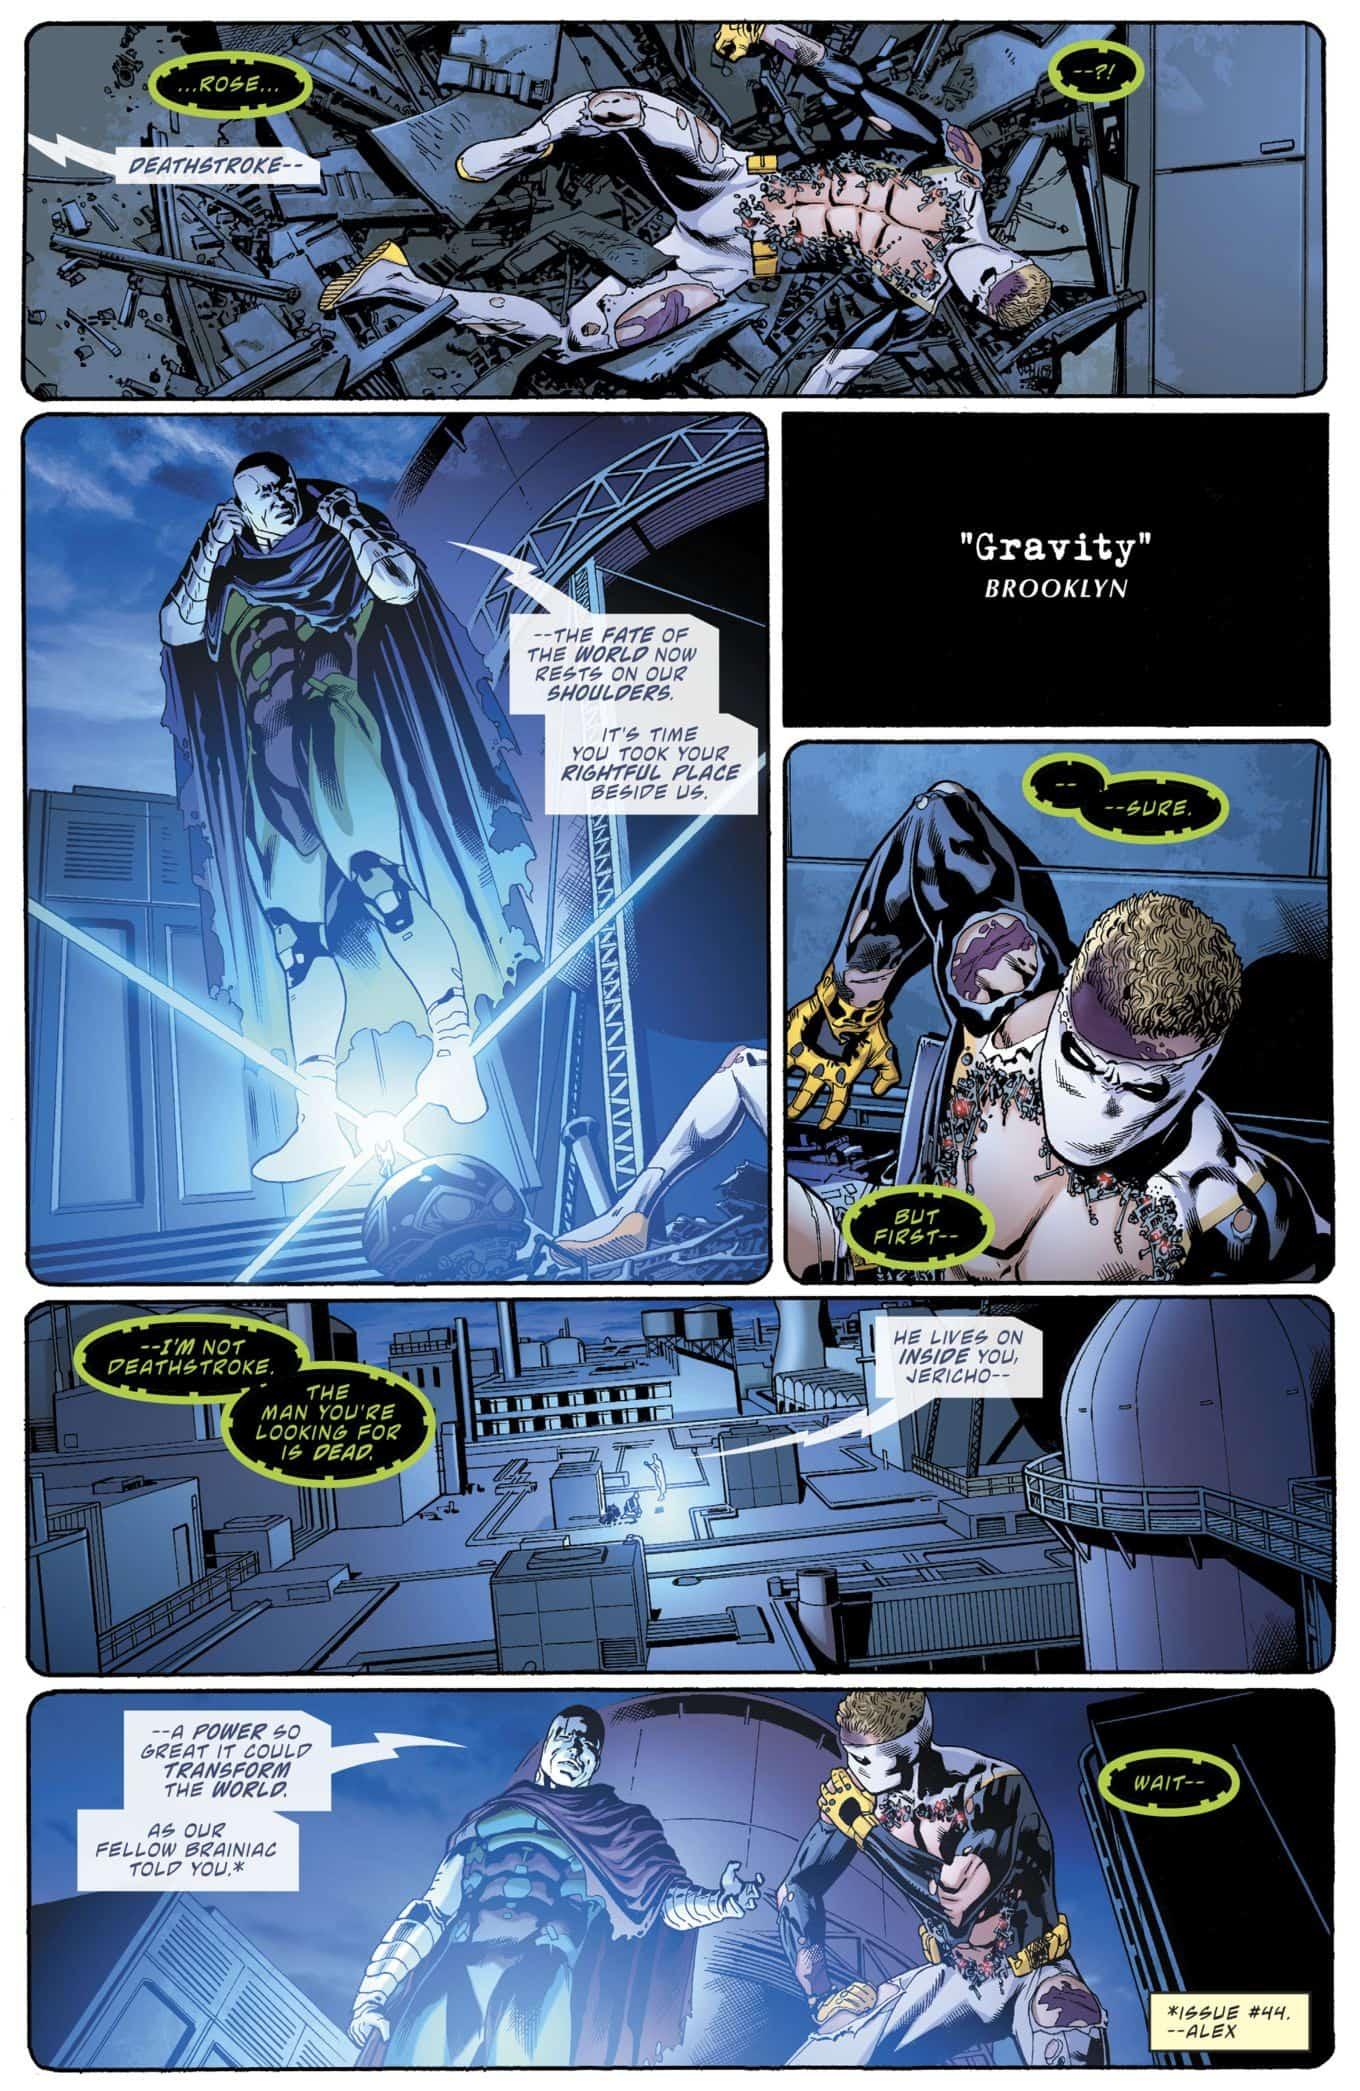 DC Comics Universe & Deathstroke #46 Spoilers & Review: A